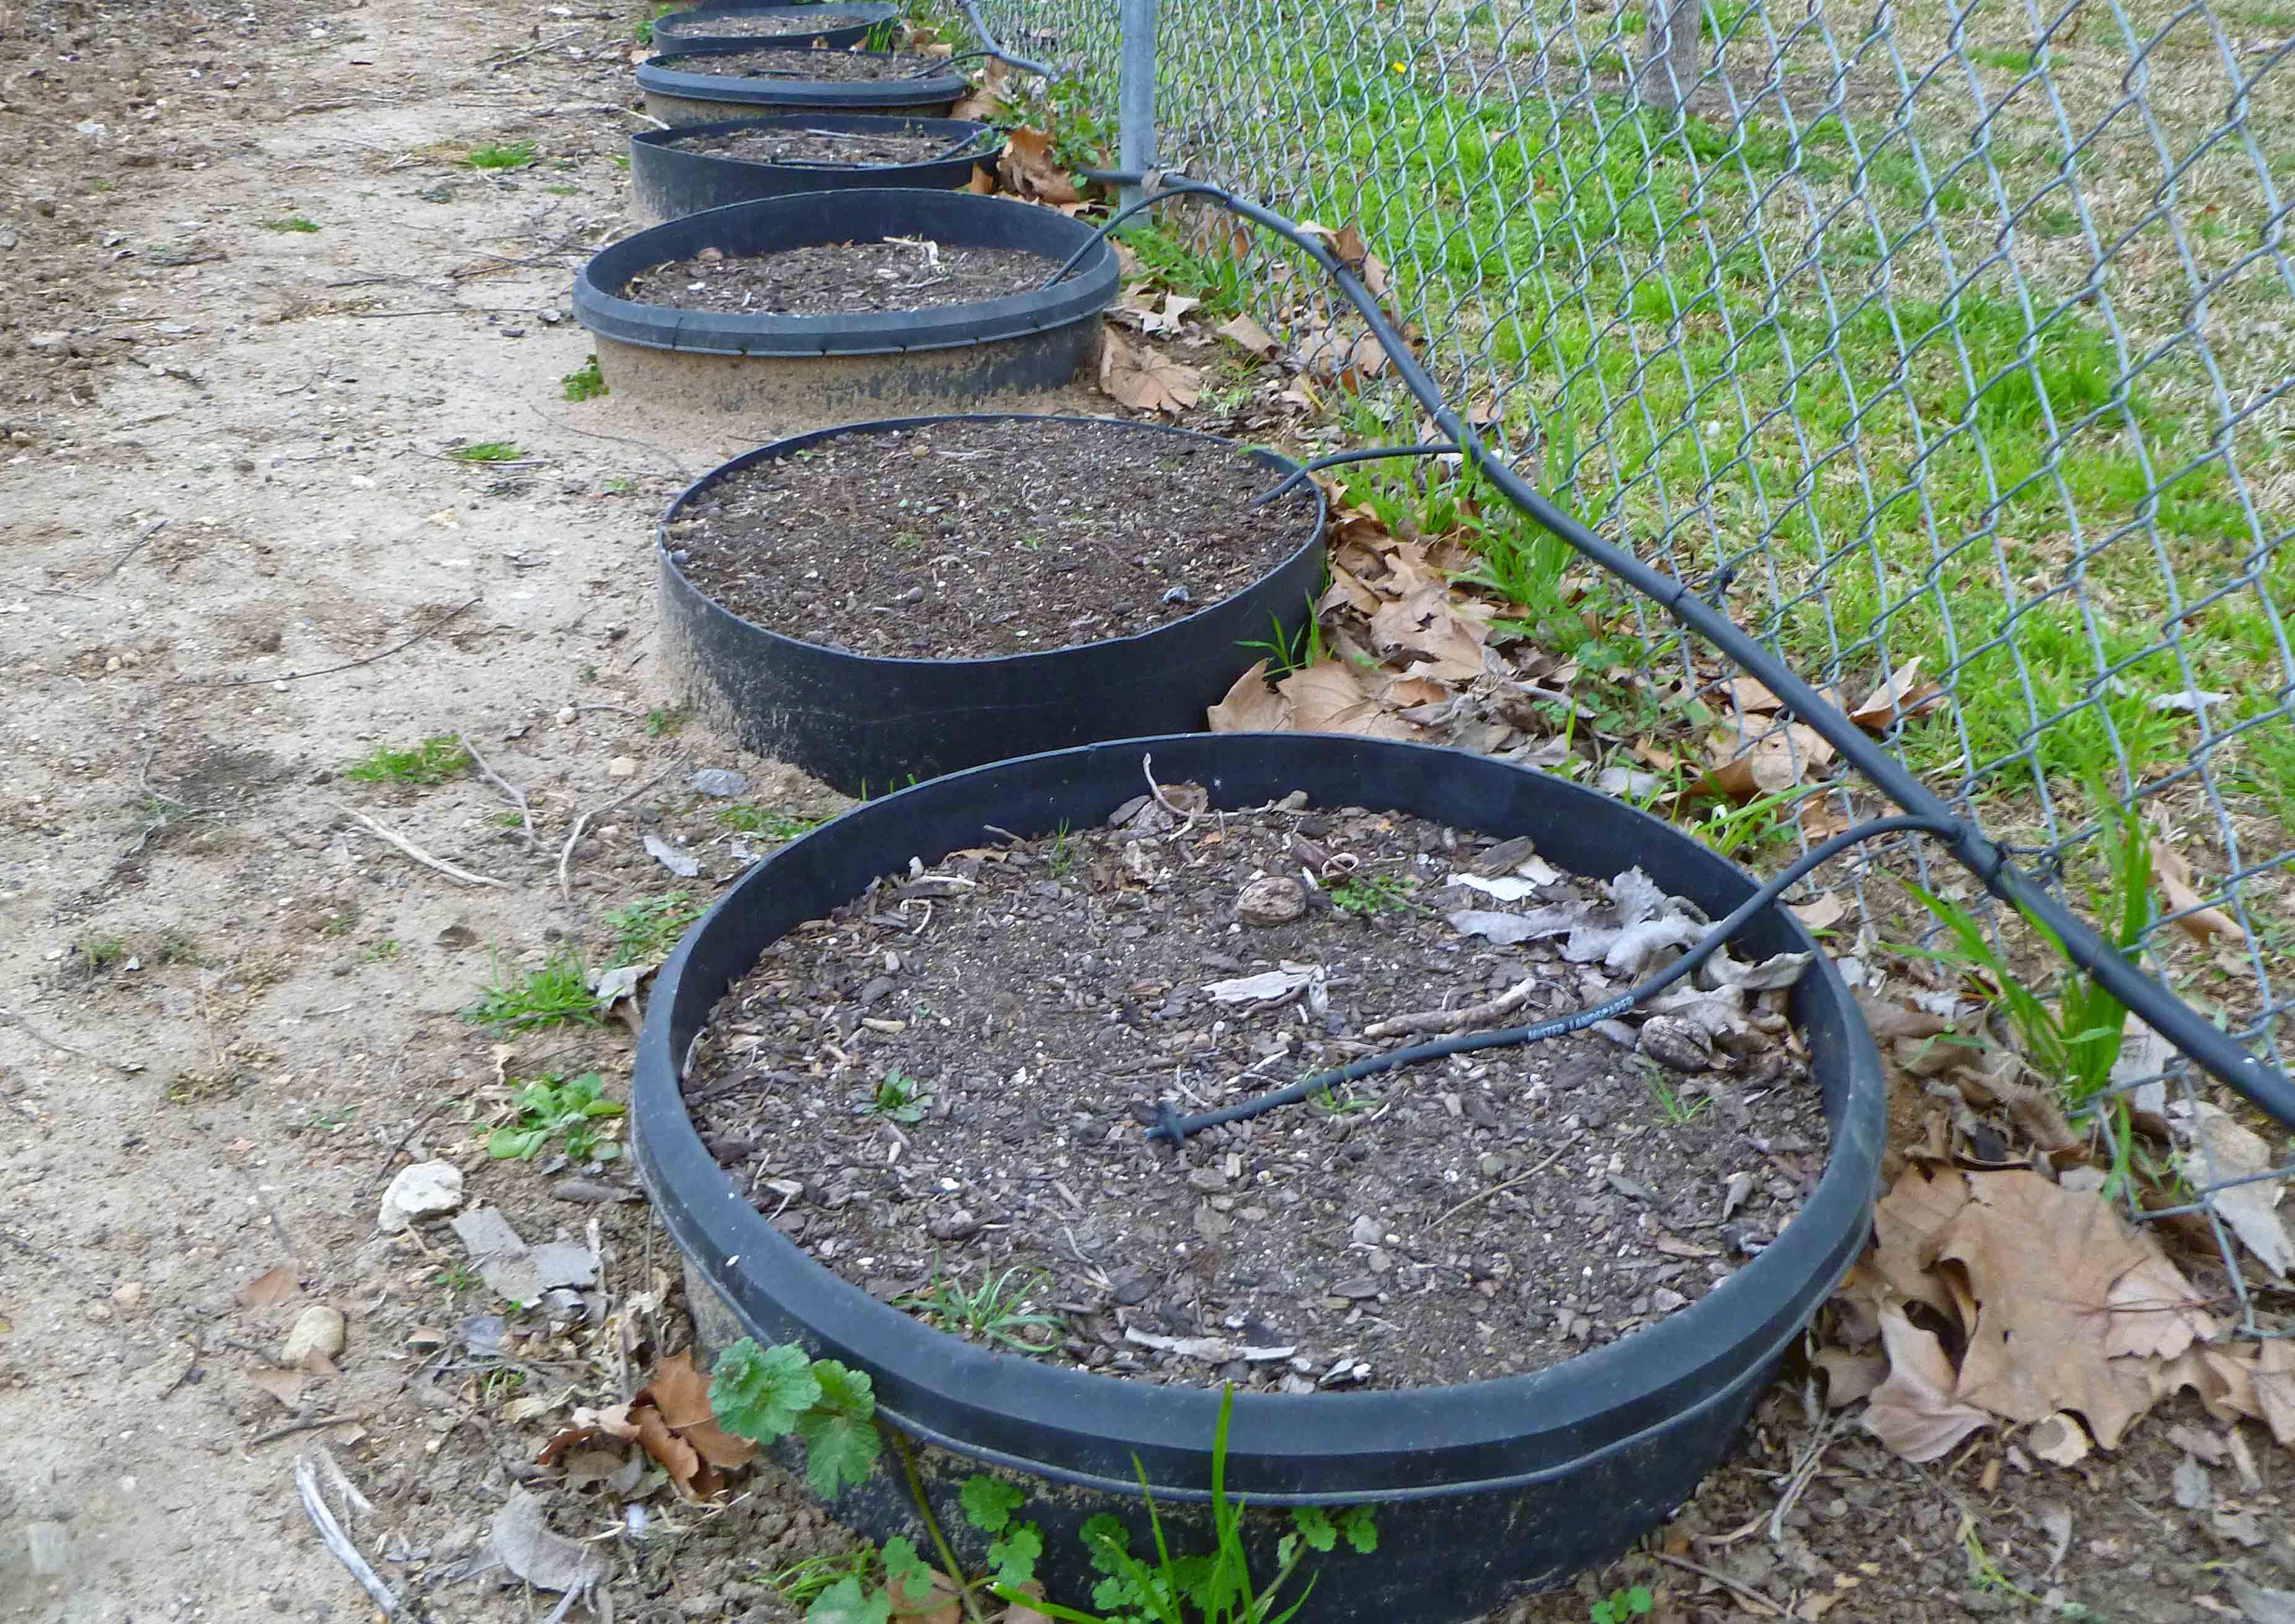 garden project for winter centex cooks